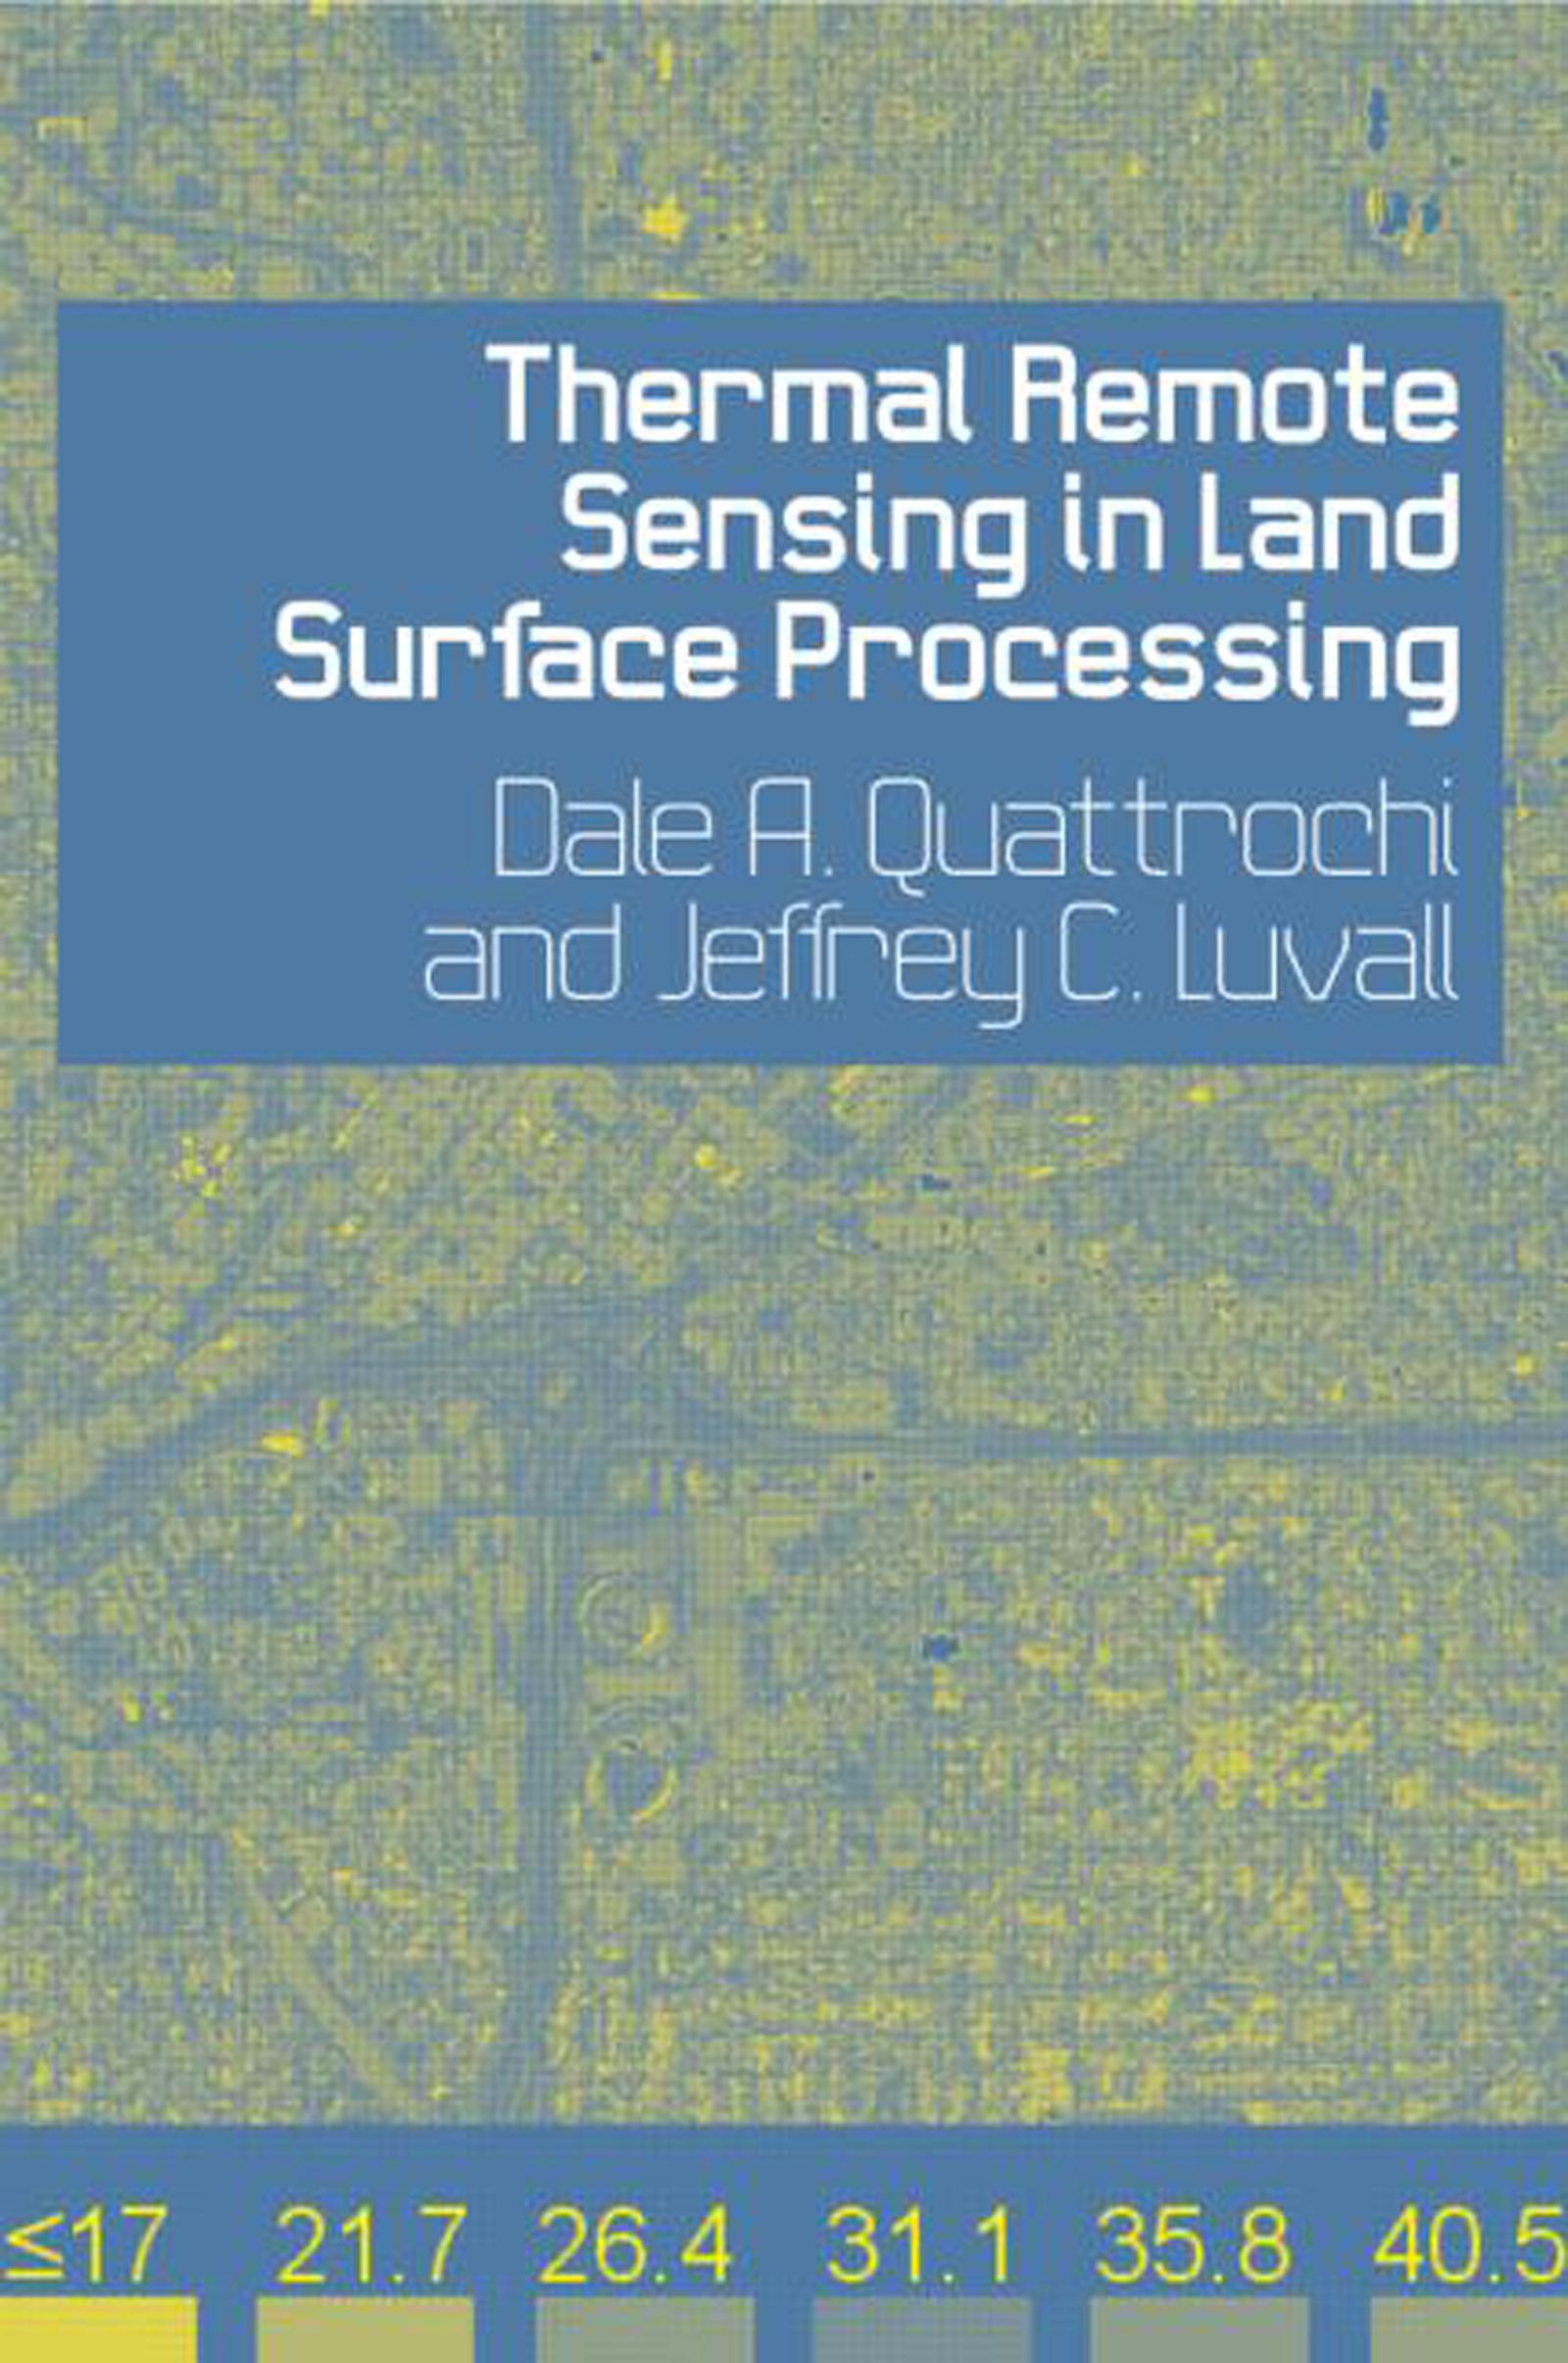 Thermal Remote Sensing in Land Surface Processing